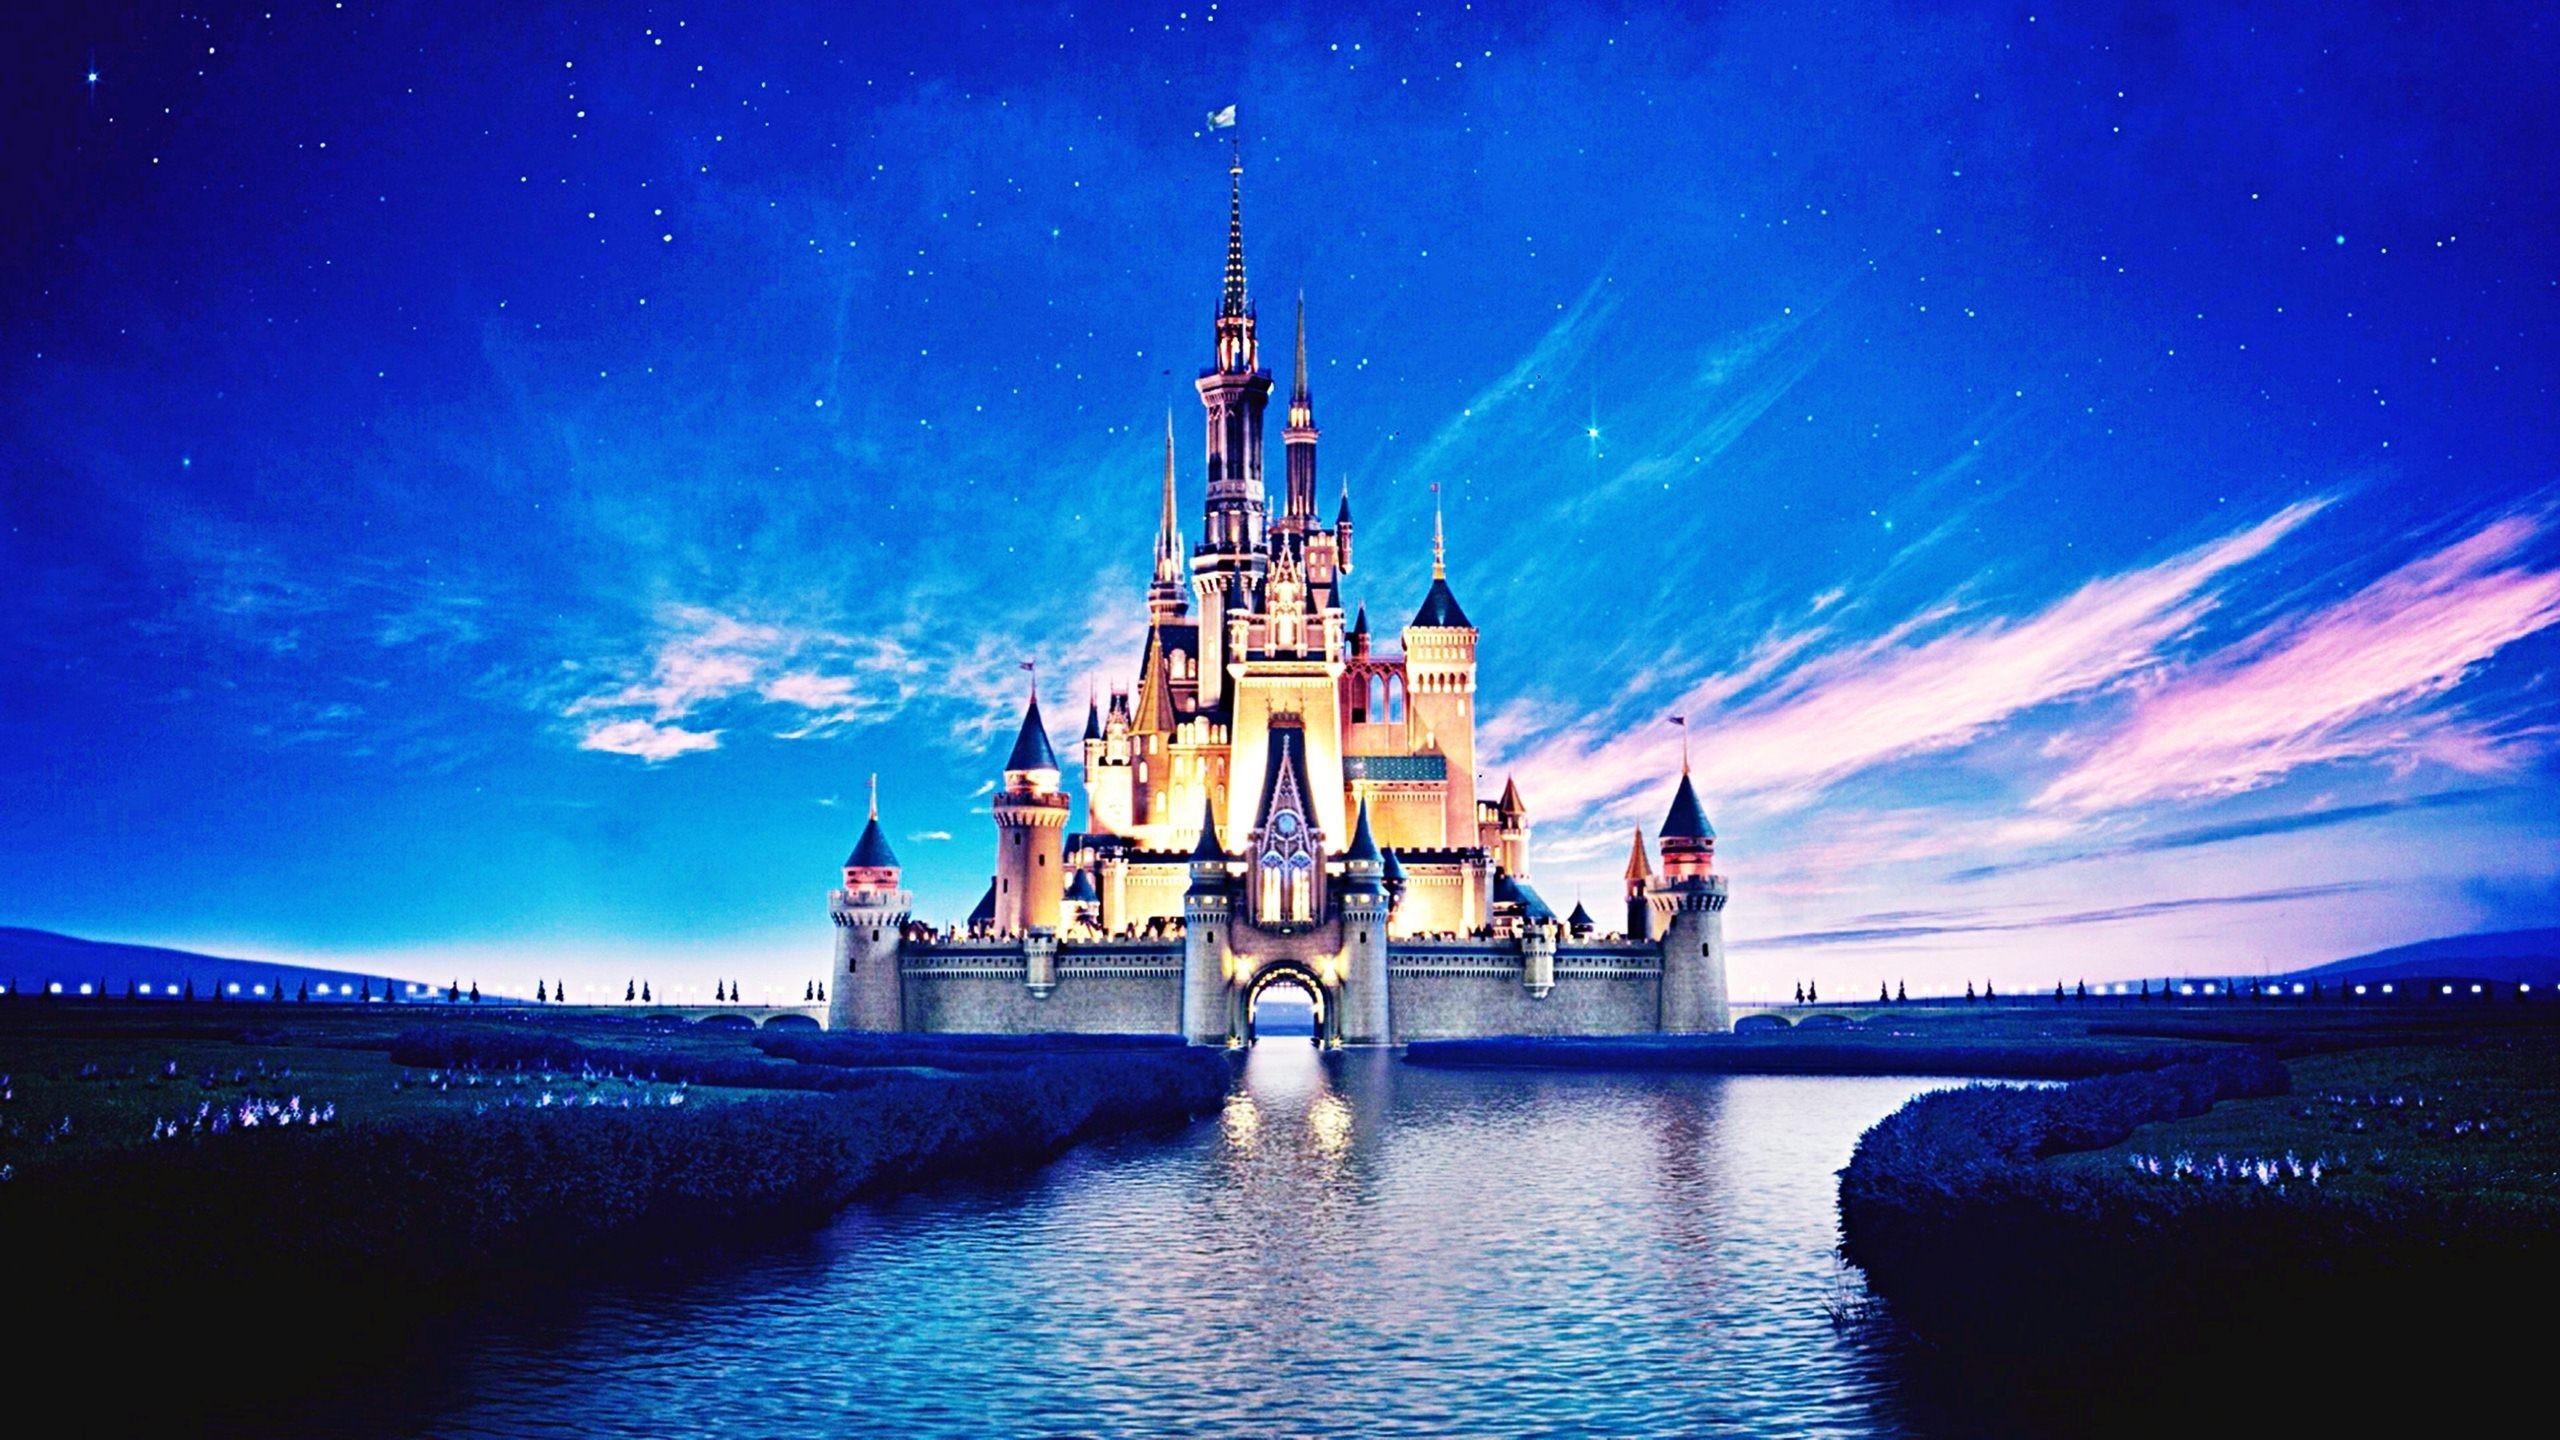 Disney Movies Hd Wallpapers: Disney Castle Wallpaper HD (72+ Images